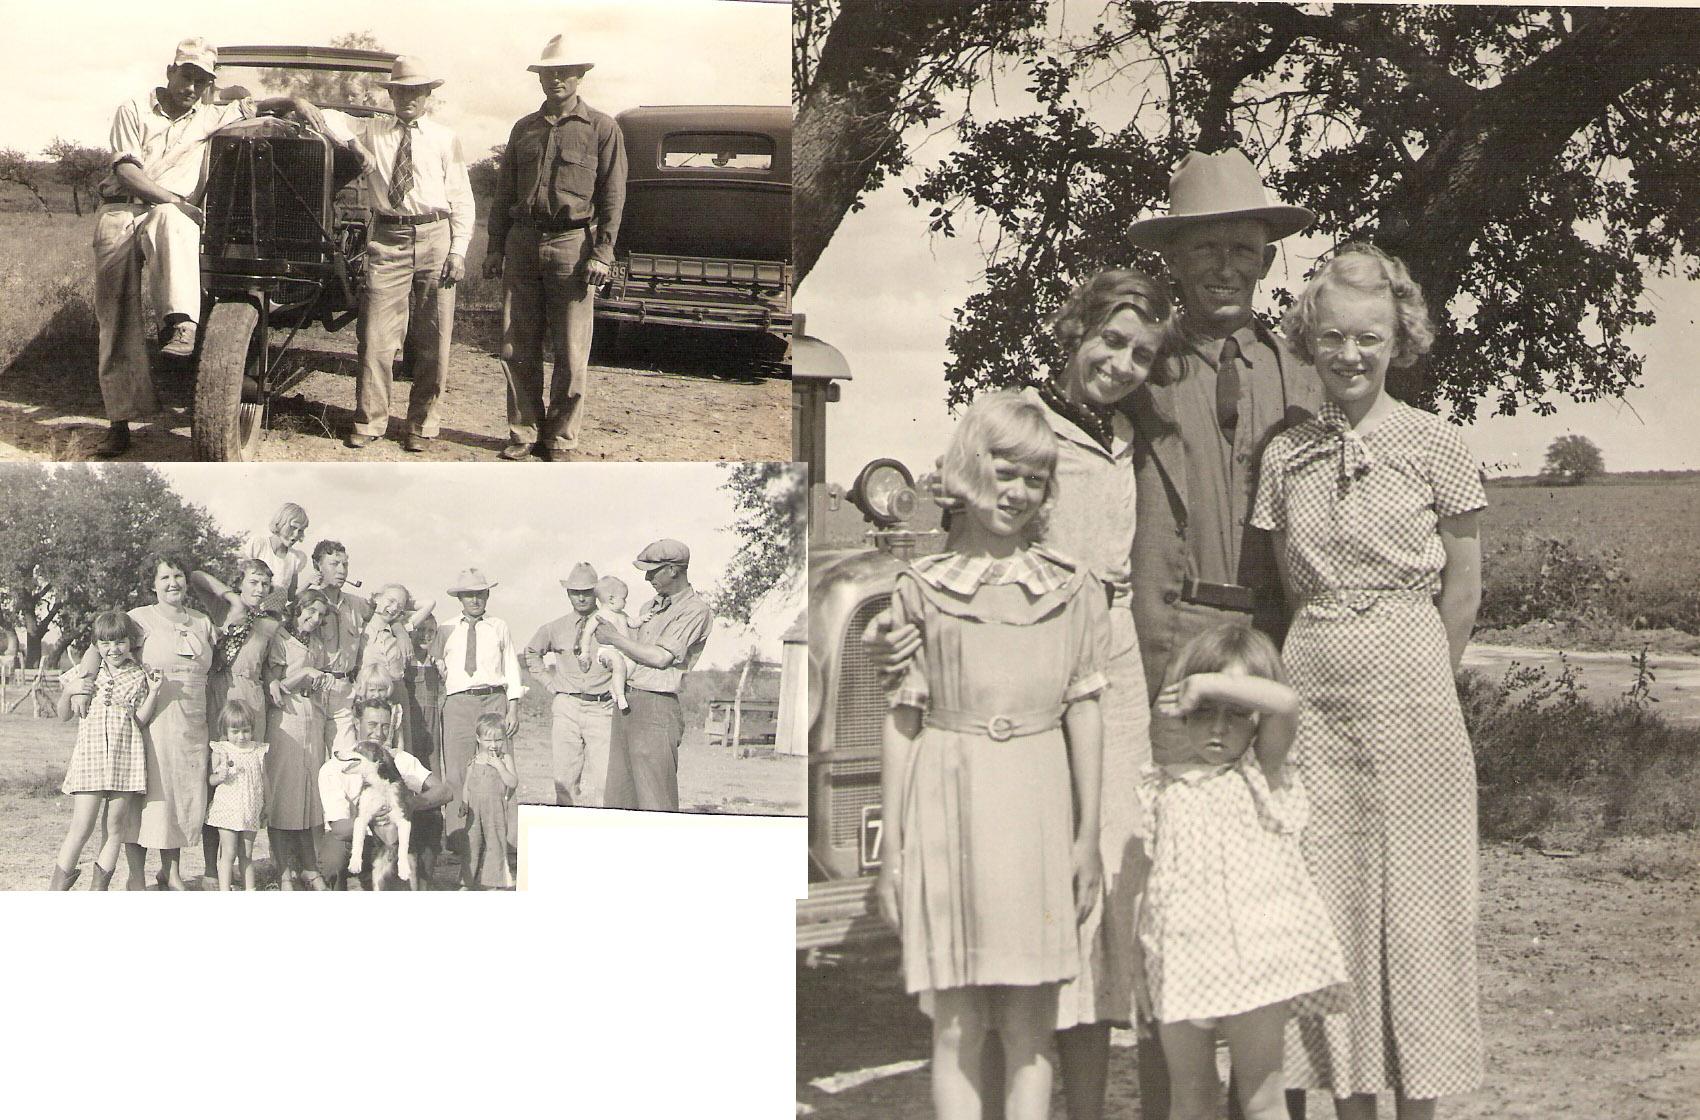 More 1935